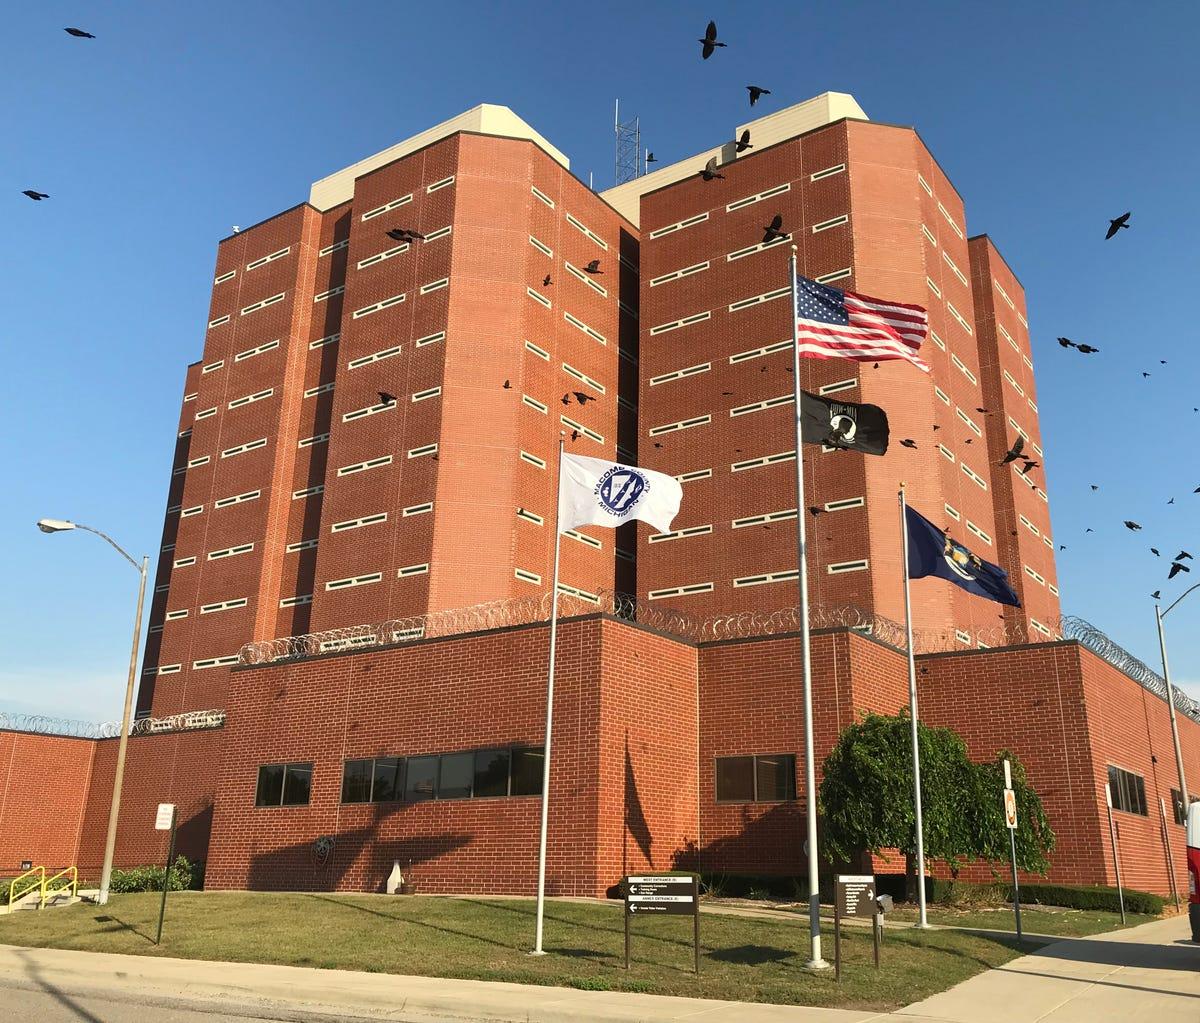 Macomb County Jail inmate dies after snorting medication